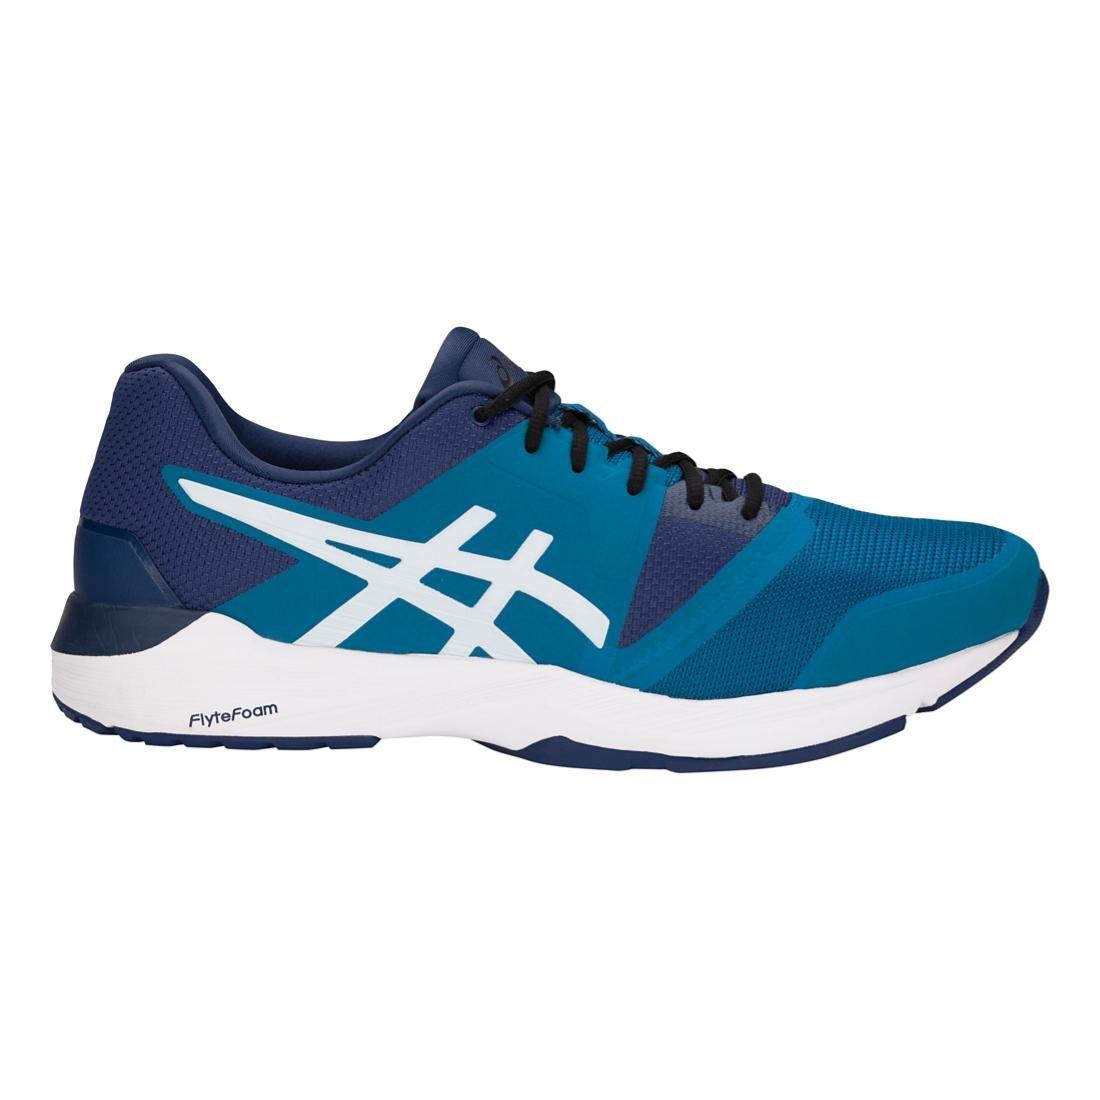 ASICS Men's Gel-Quest FF Running Shoe B07DNHXTXV 9.5 D(M) US|Race Blue/White